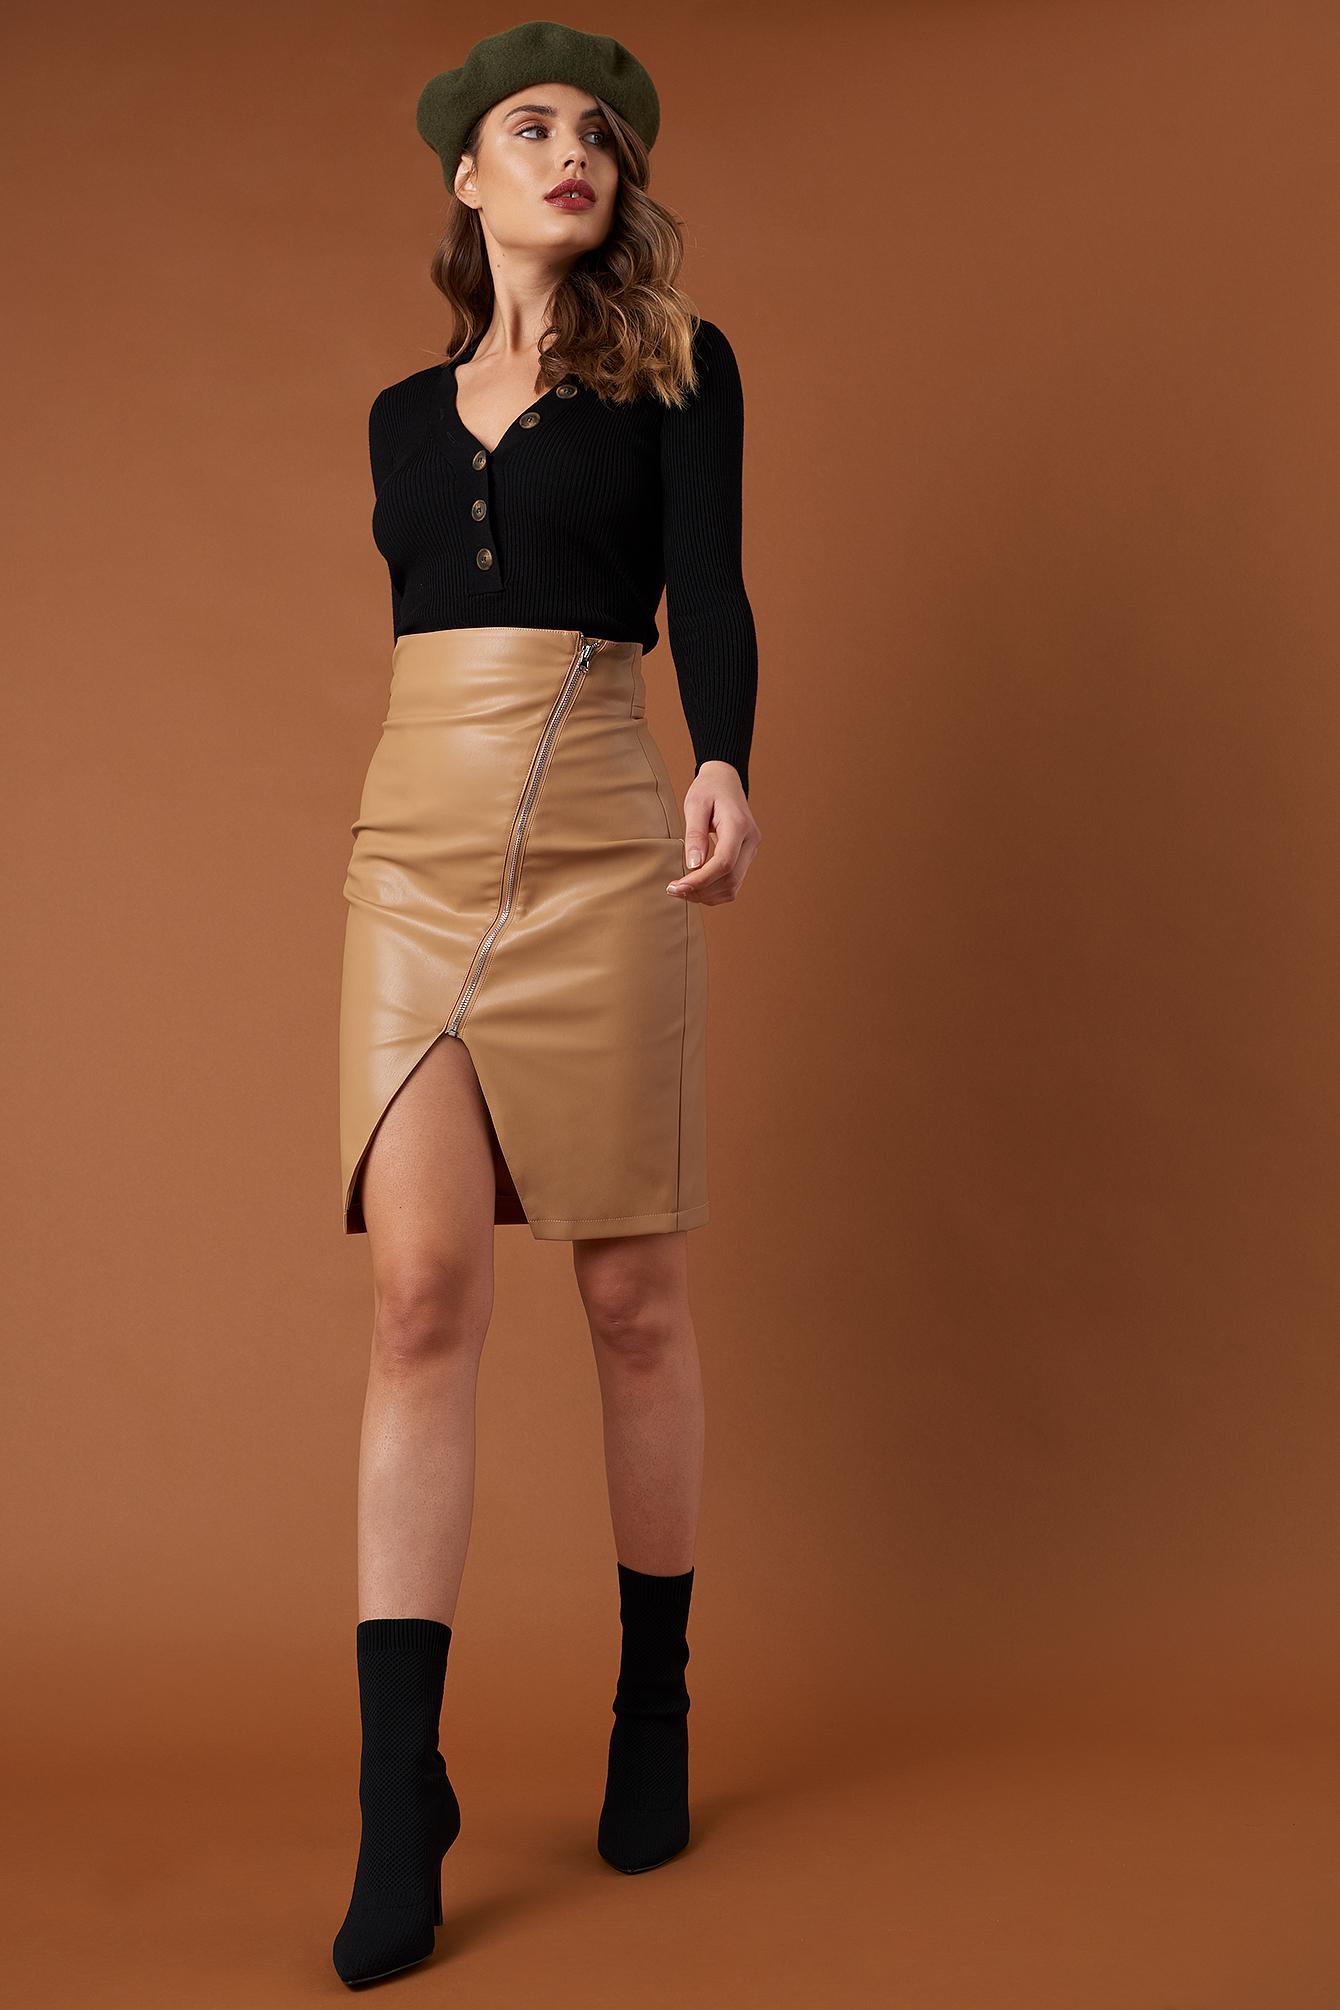 afaccf4456 NA-KD Front Zipper Pu Skirt Tan in Brown - Lyst